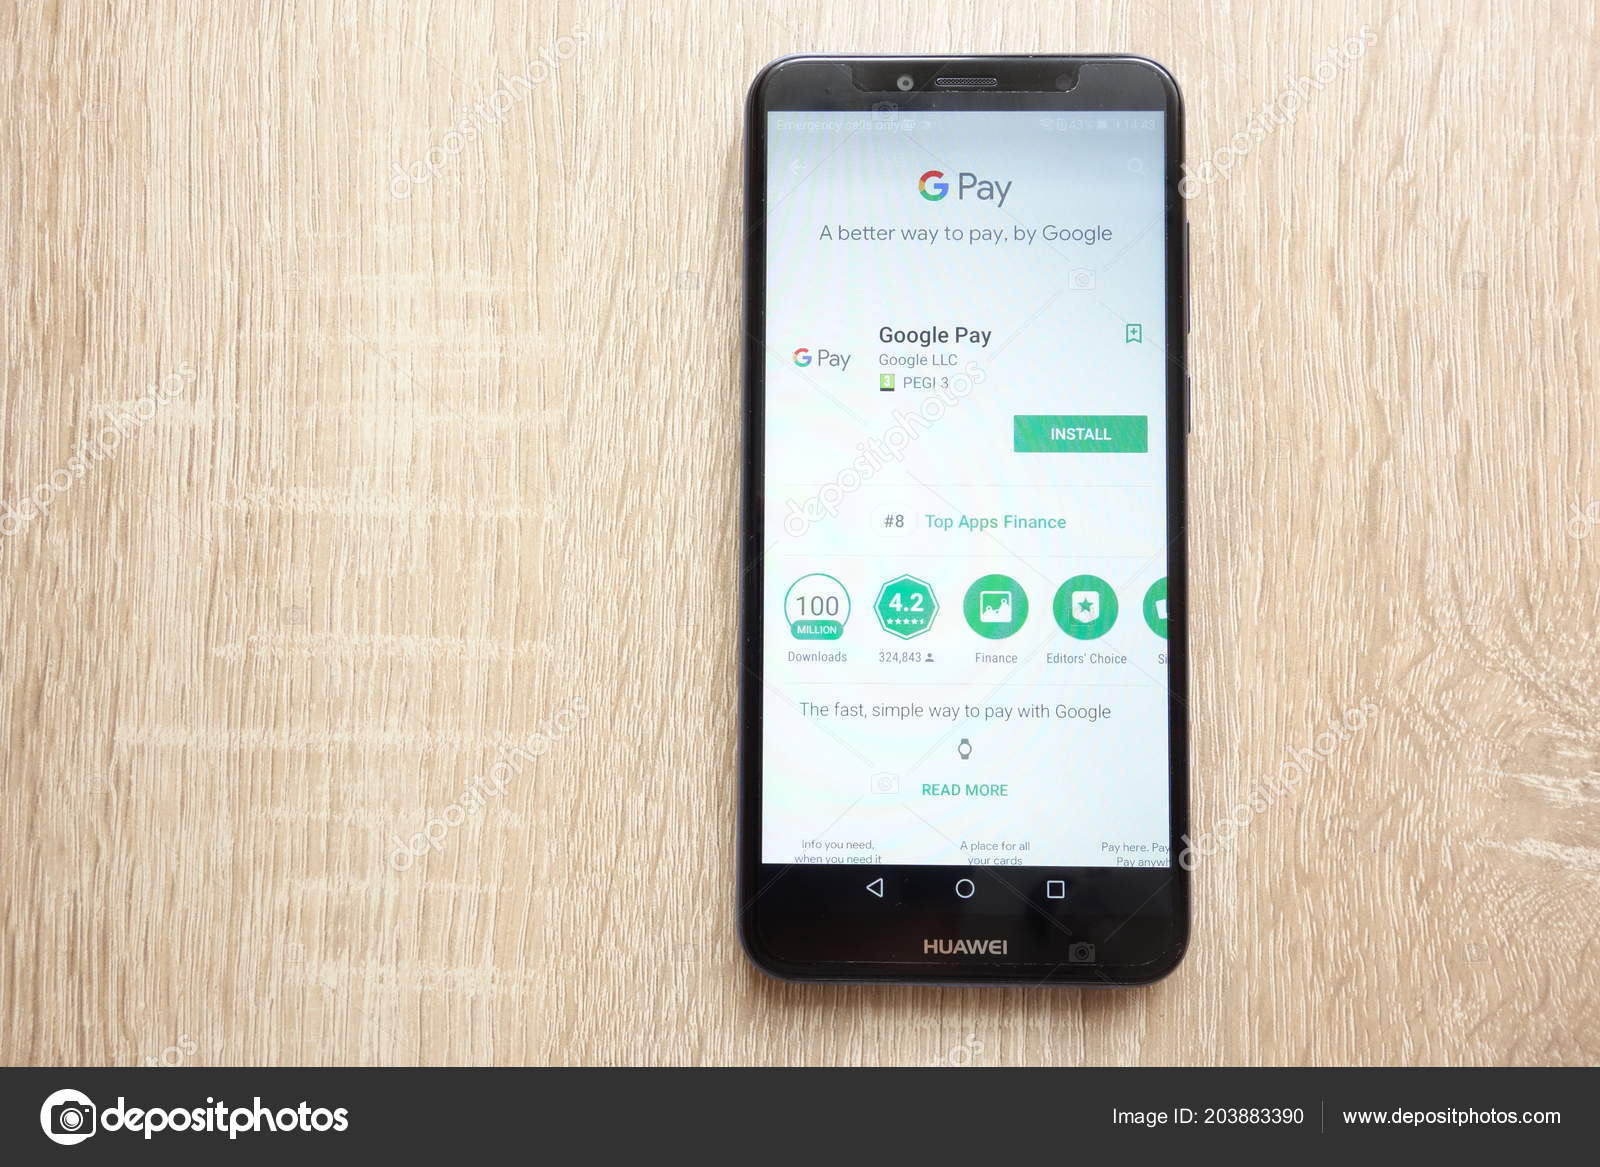 Konskie Poland June 2018 Google Pay App Google Play Store – Stock